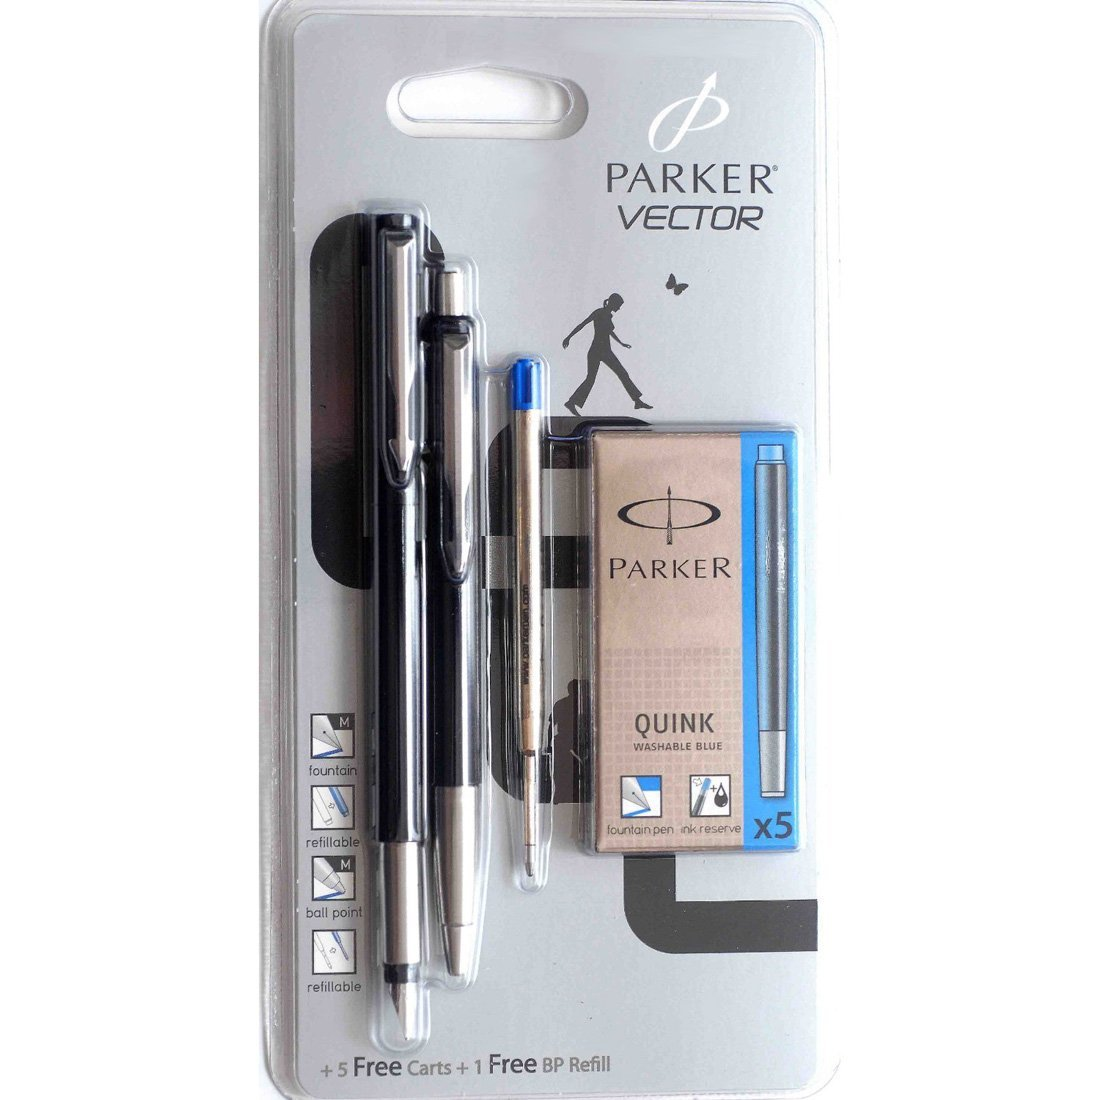 Parker Vector Black Fountain Pen & Ballpoint Pen Set + 5 Free Cartridges & 1 Free Ballpoint Refill